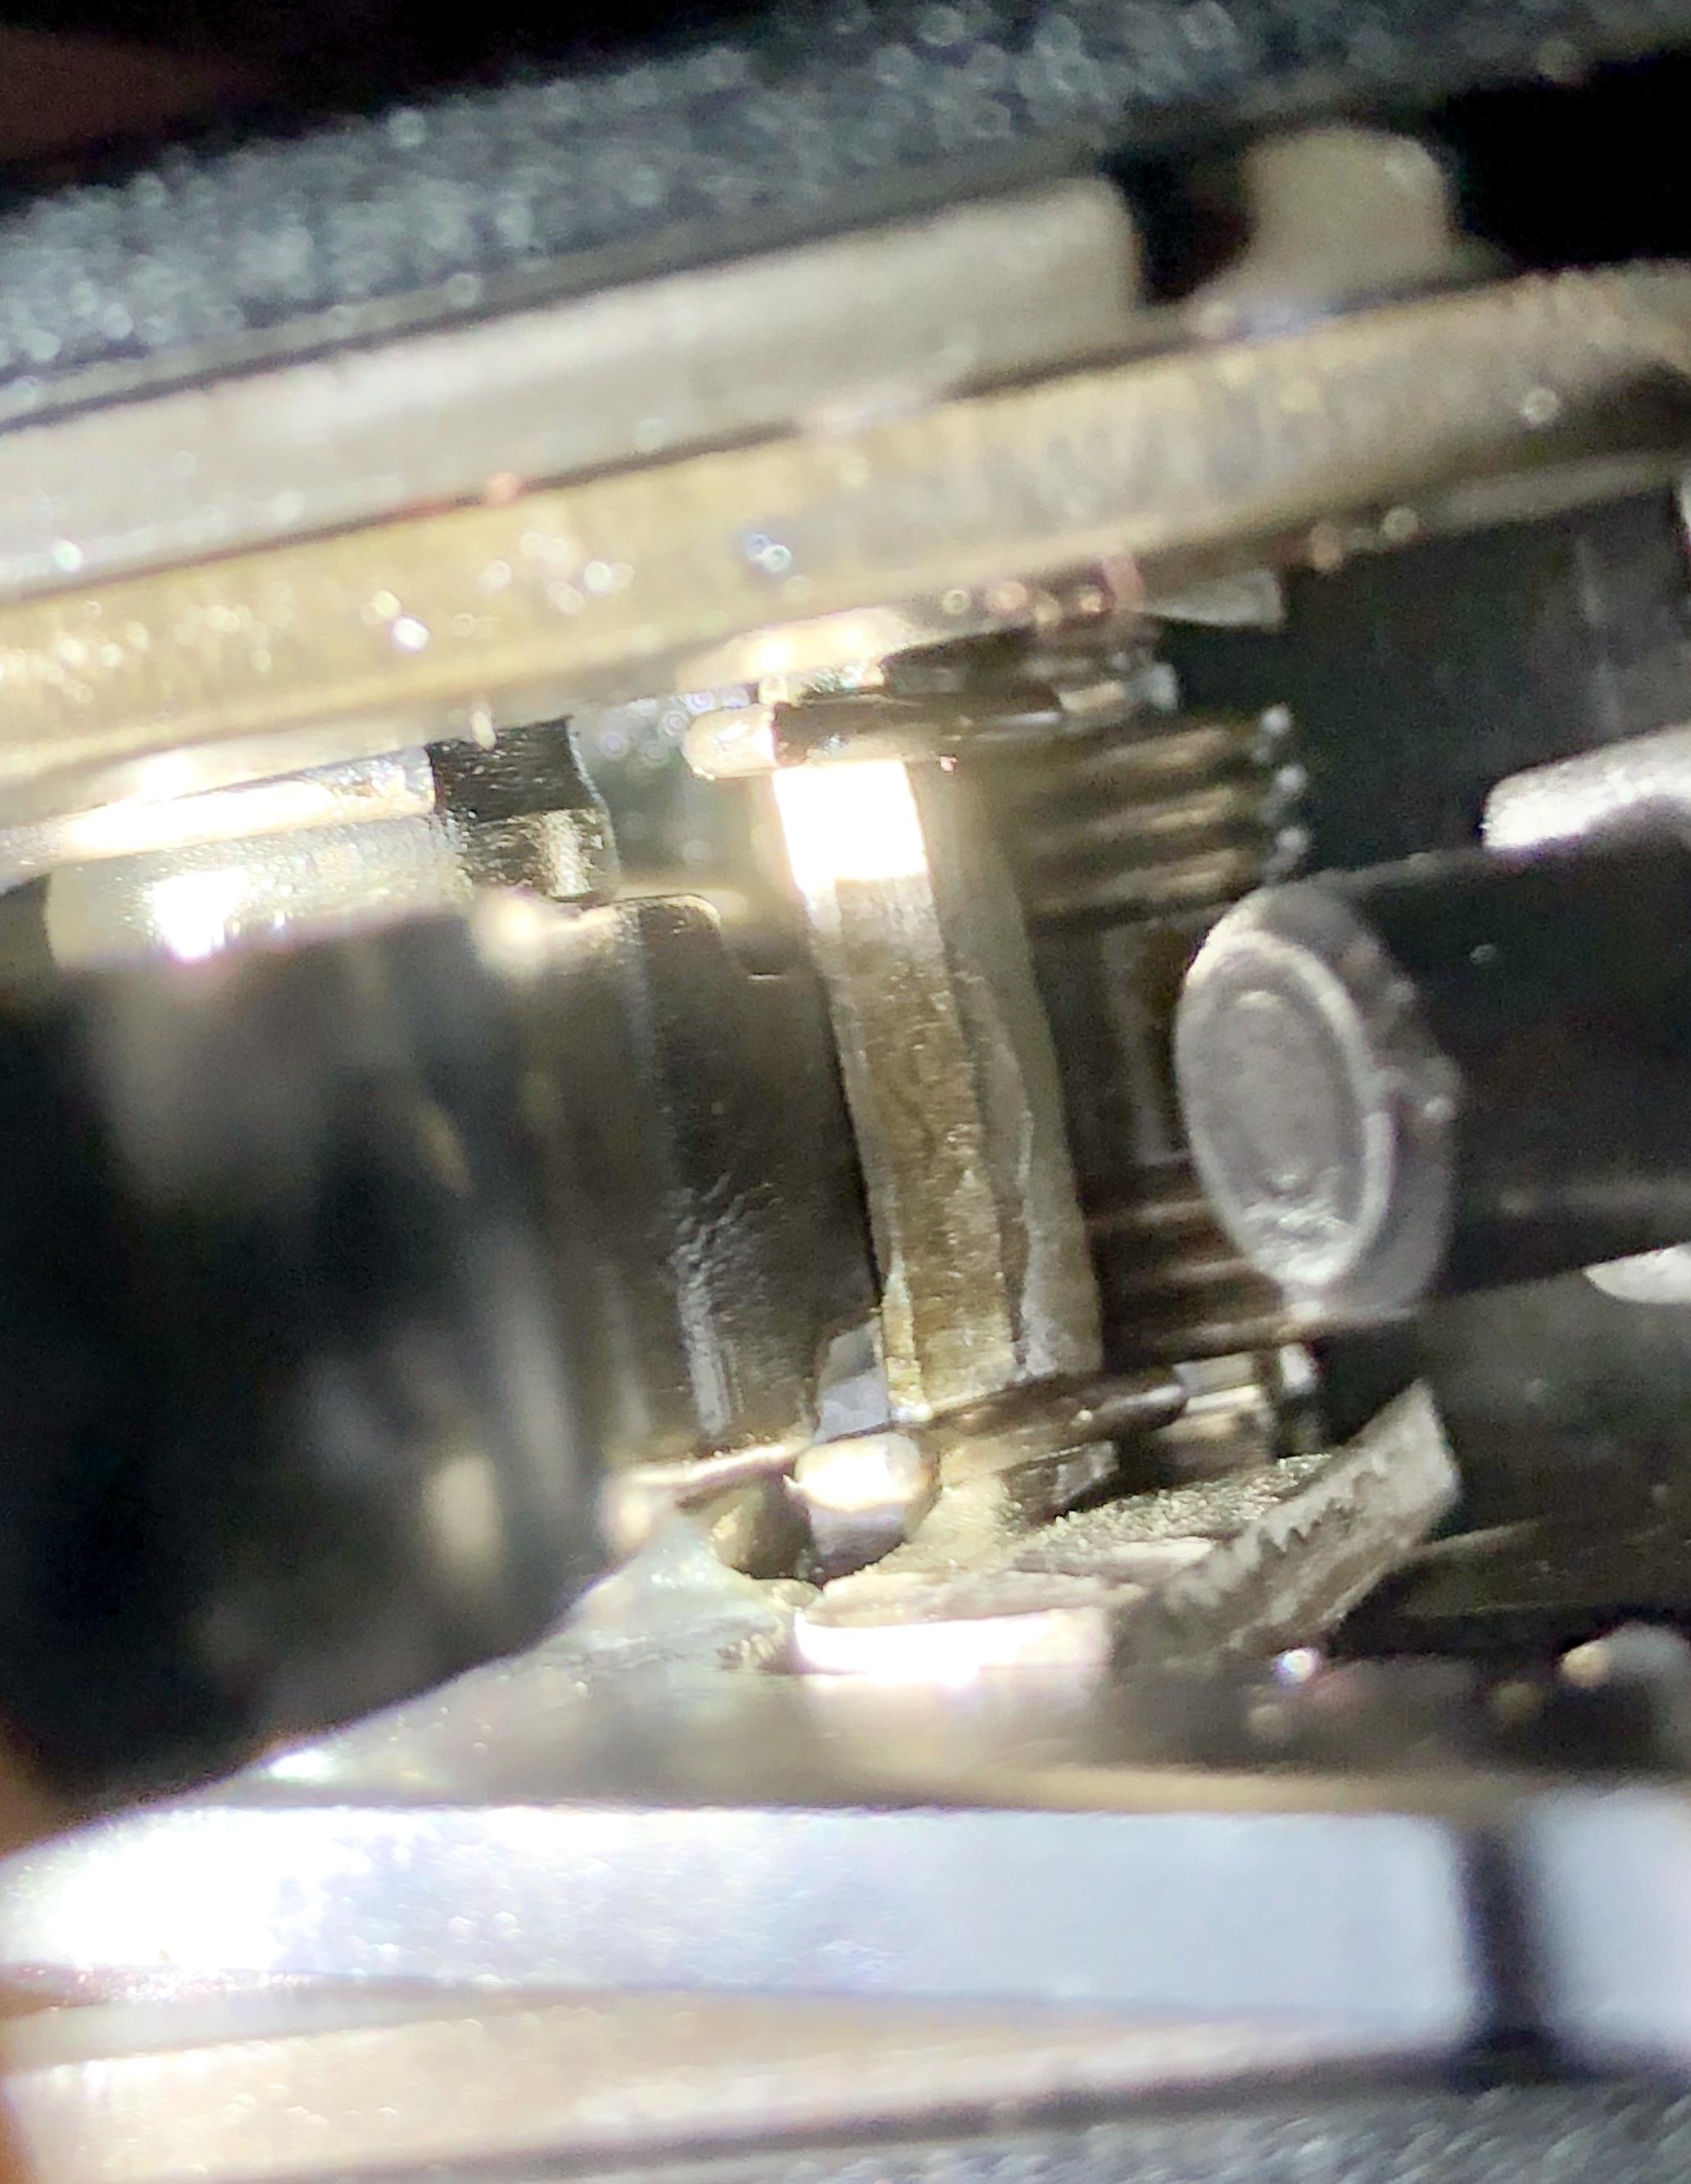 MP5 sear question-37034d20-abf3-4e5f-a1ec-cc36eac79fa6_1539189384959.jpeg